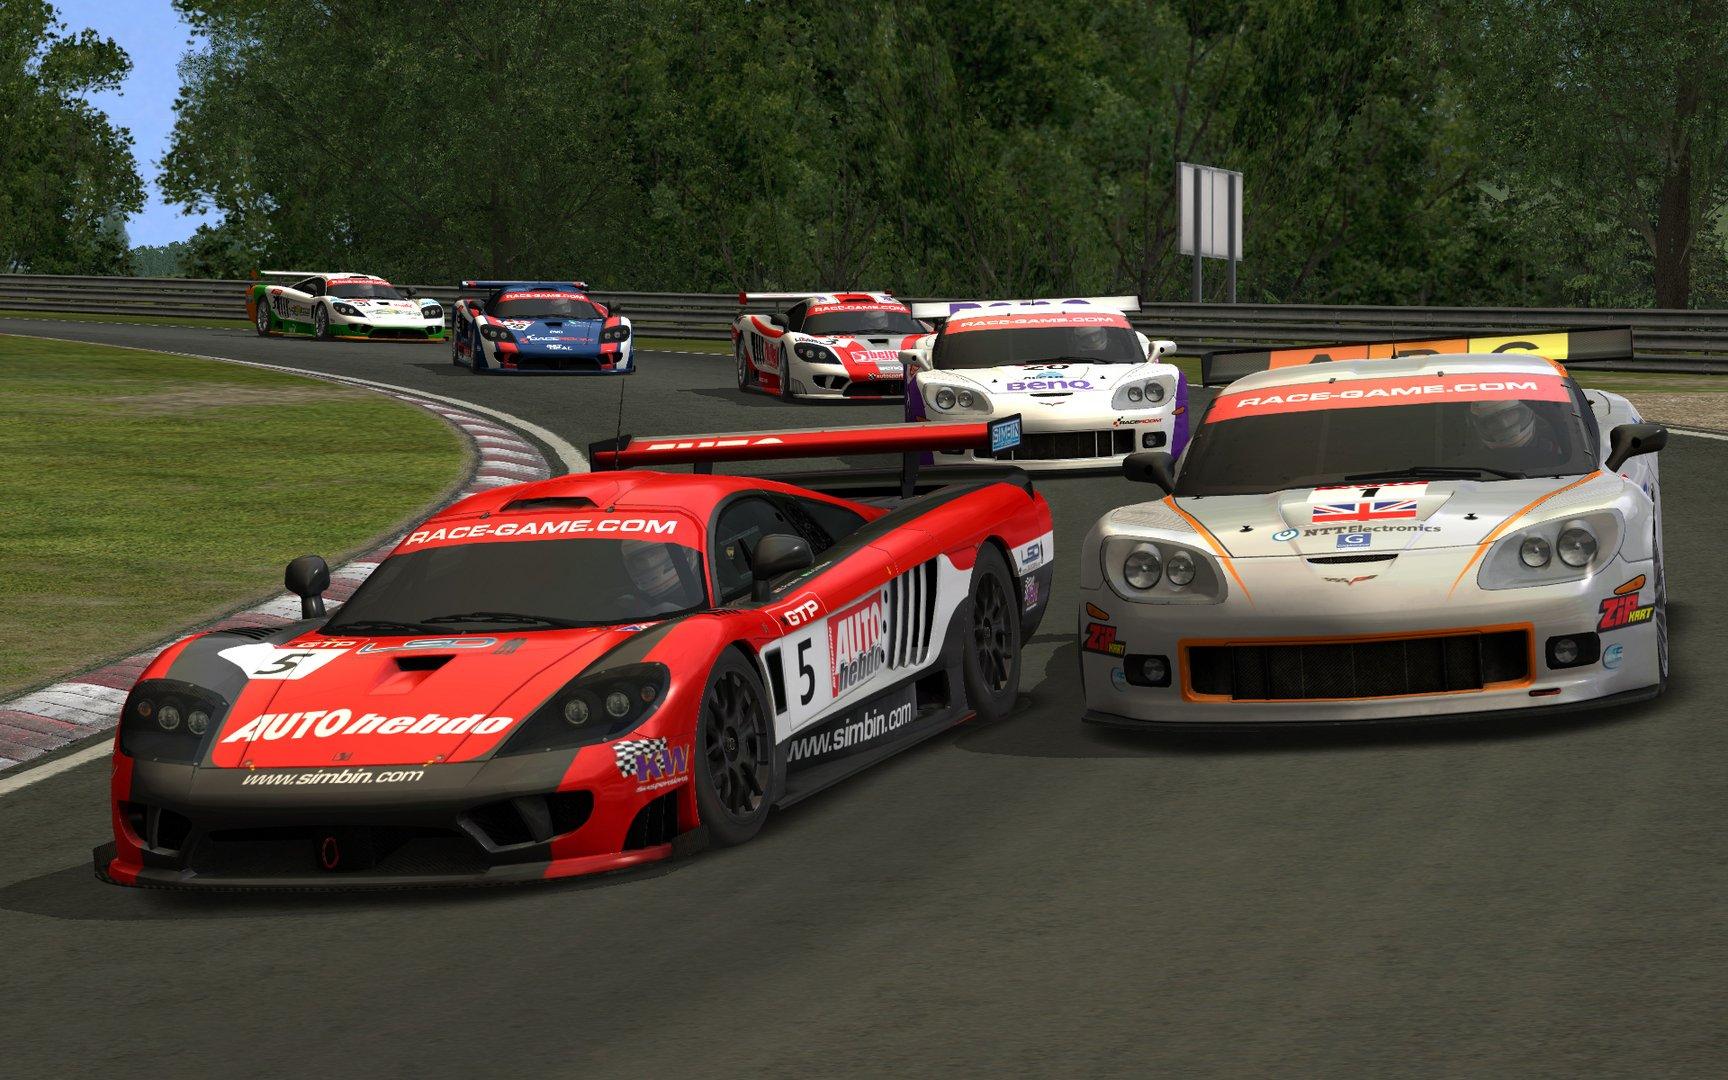 GTR Evolution review